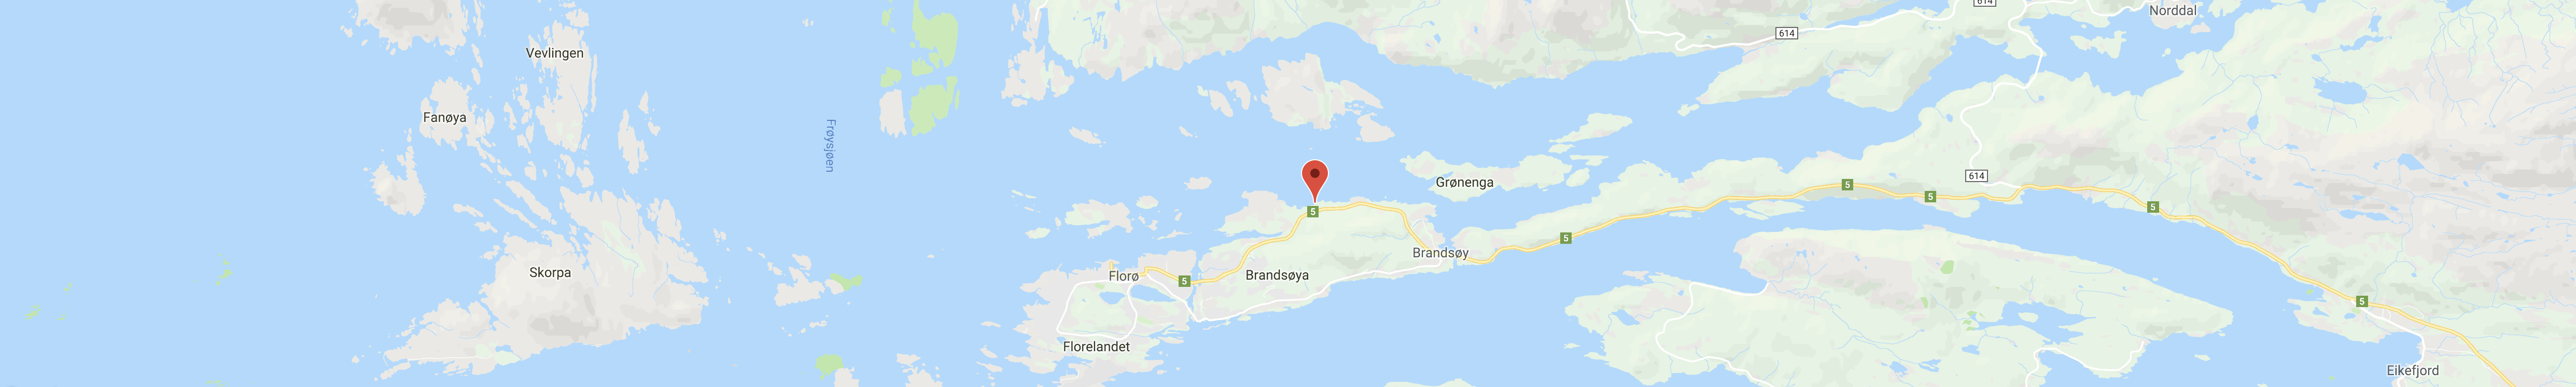 Kart Florø, FMV AS Botnastranda 6 6900 FLORØ